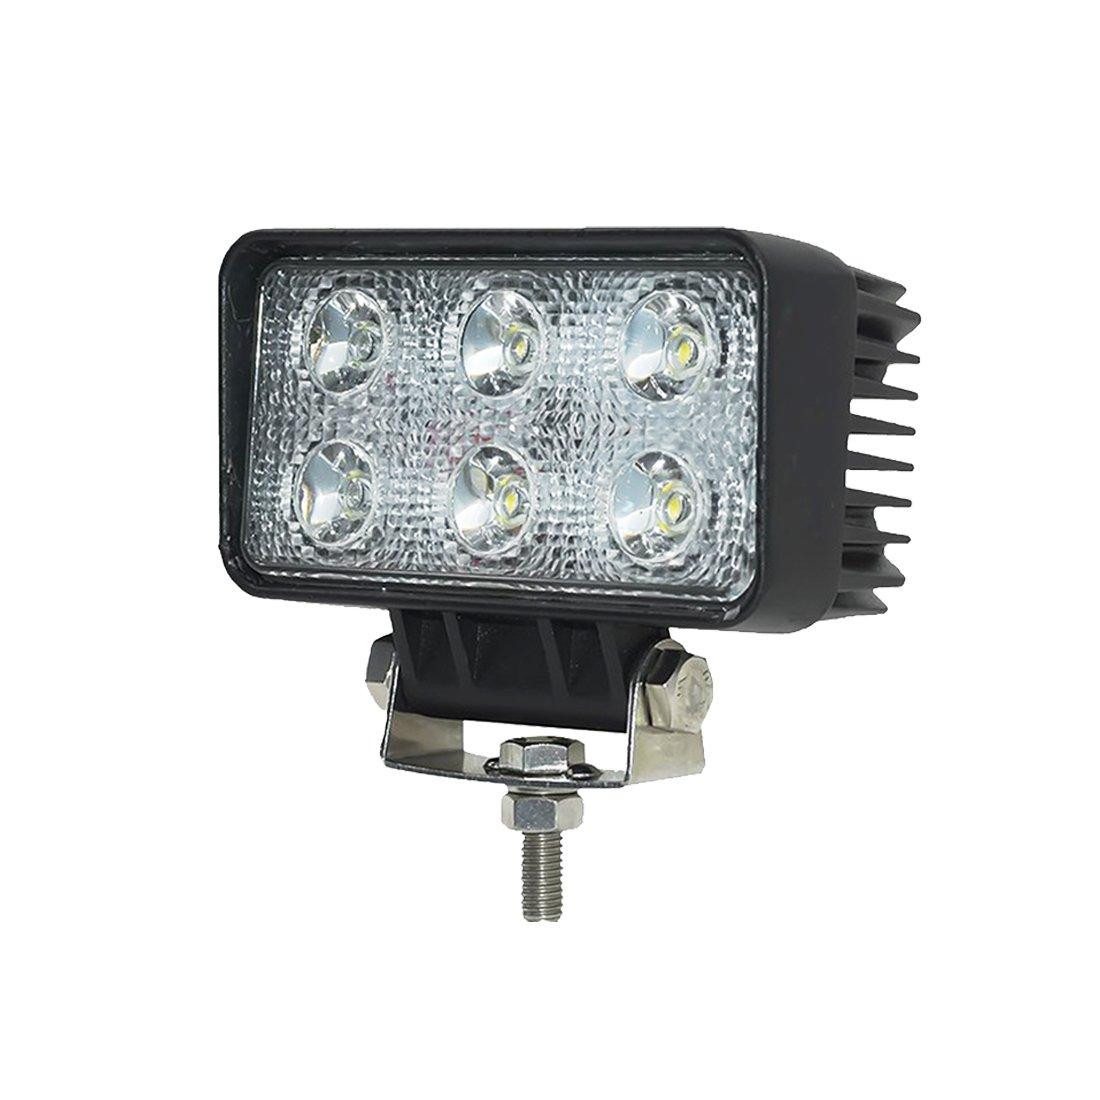 LED Arbeitsscheinwerfer, JieHe Led Arbeitslicht Bar 1800LM Led Scheinwerfer 12v 18W IP67 fü r Offroad SUV UTV ATV Traktor Bagger